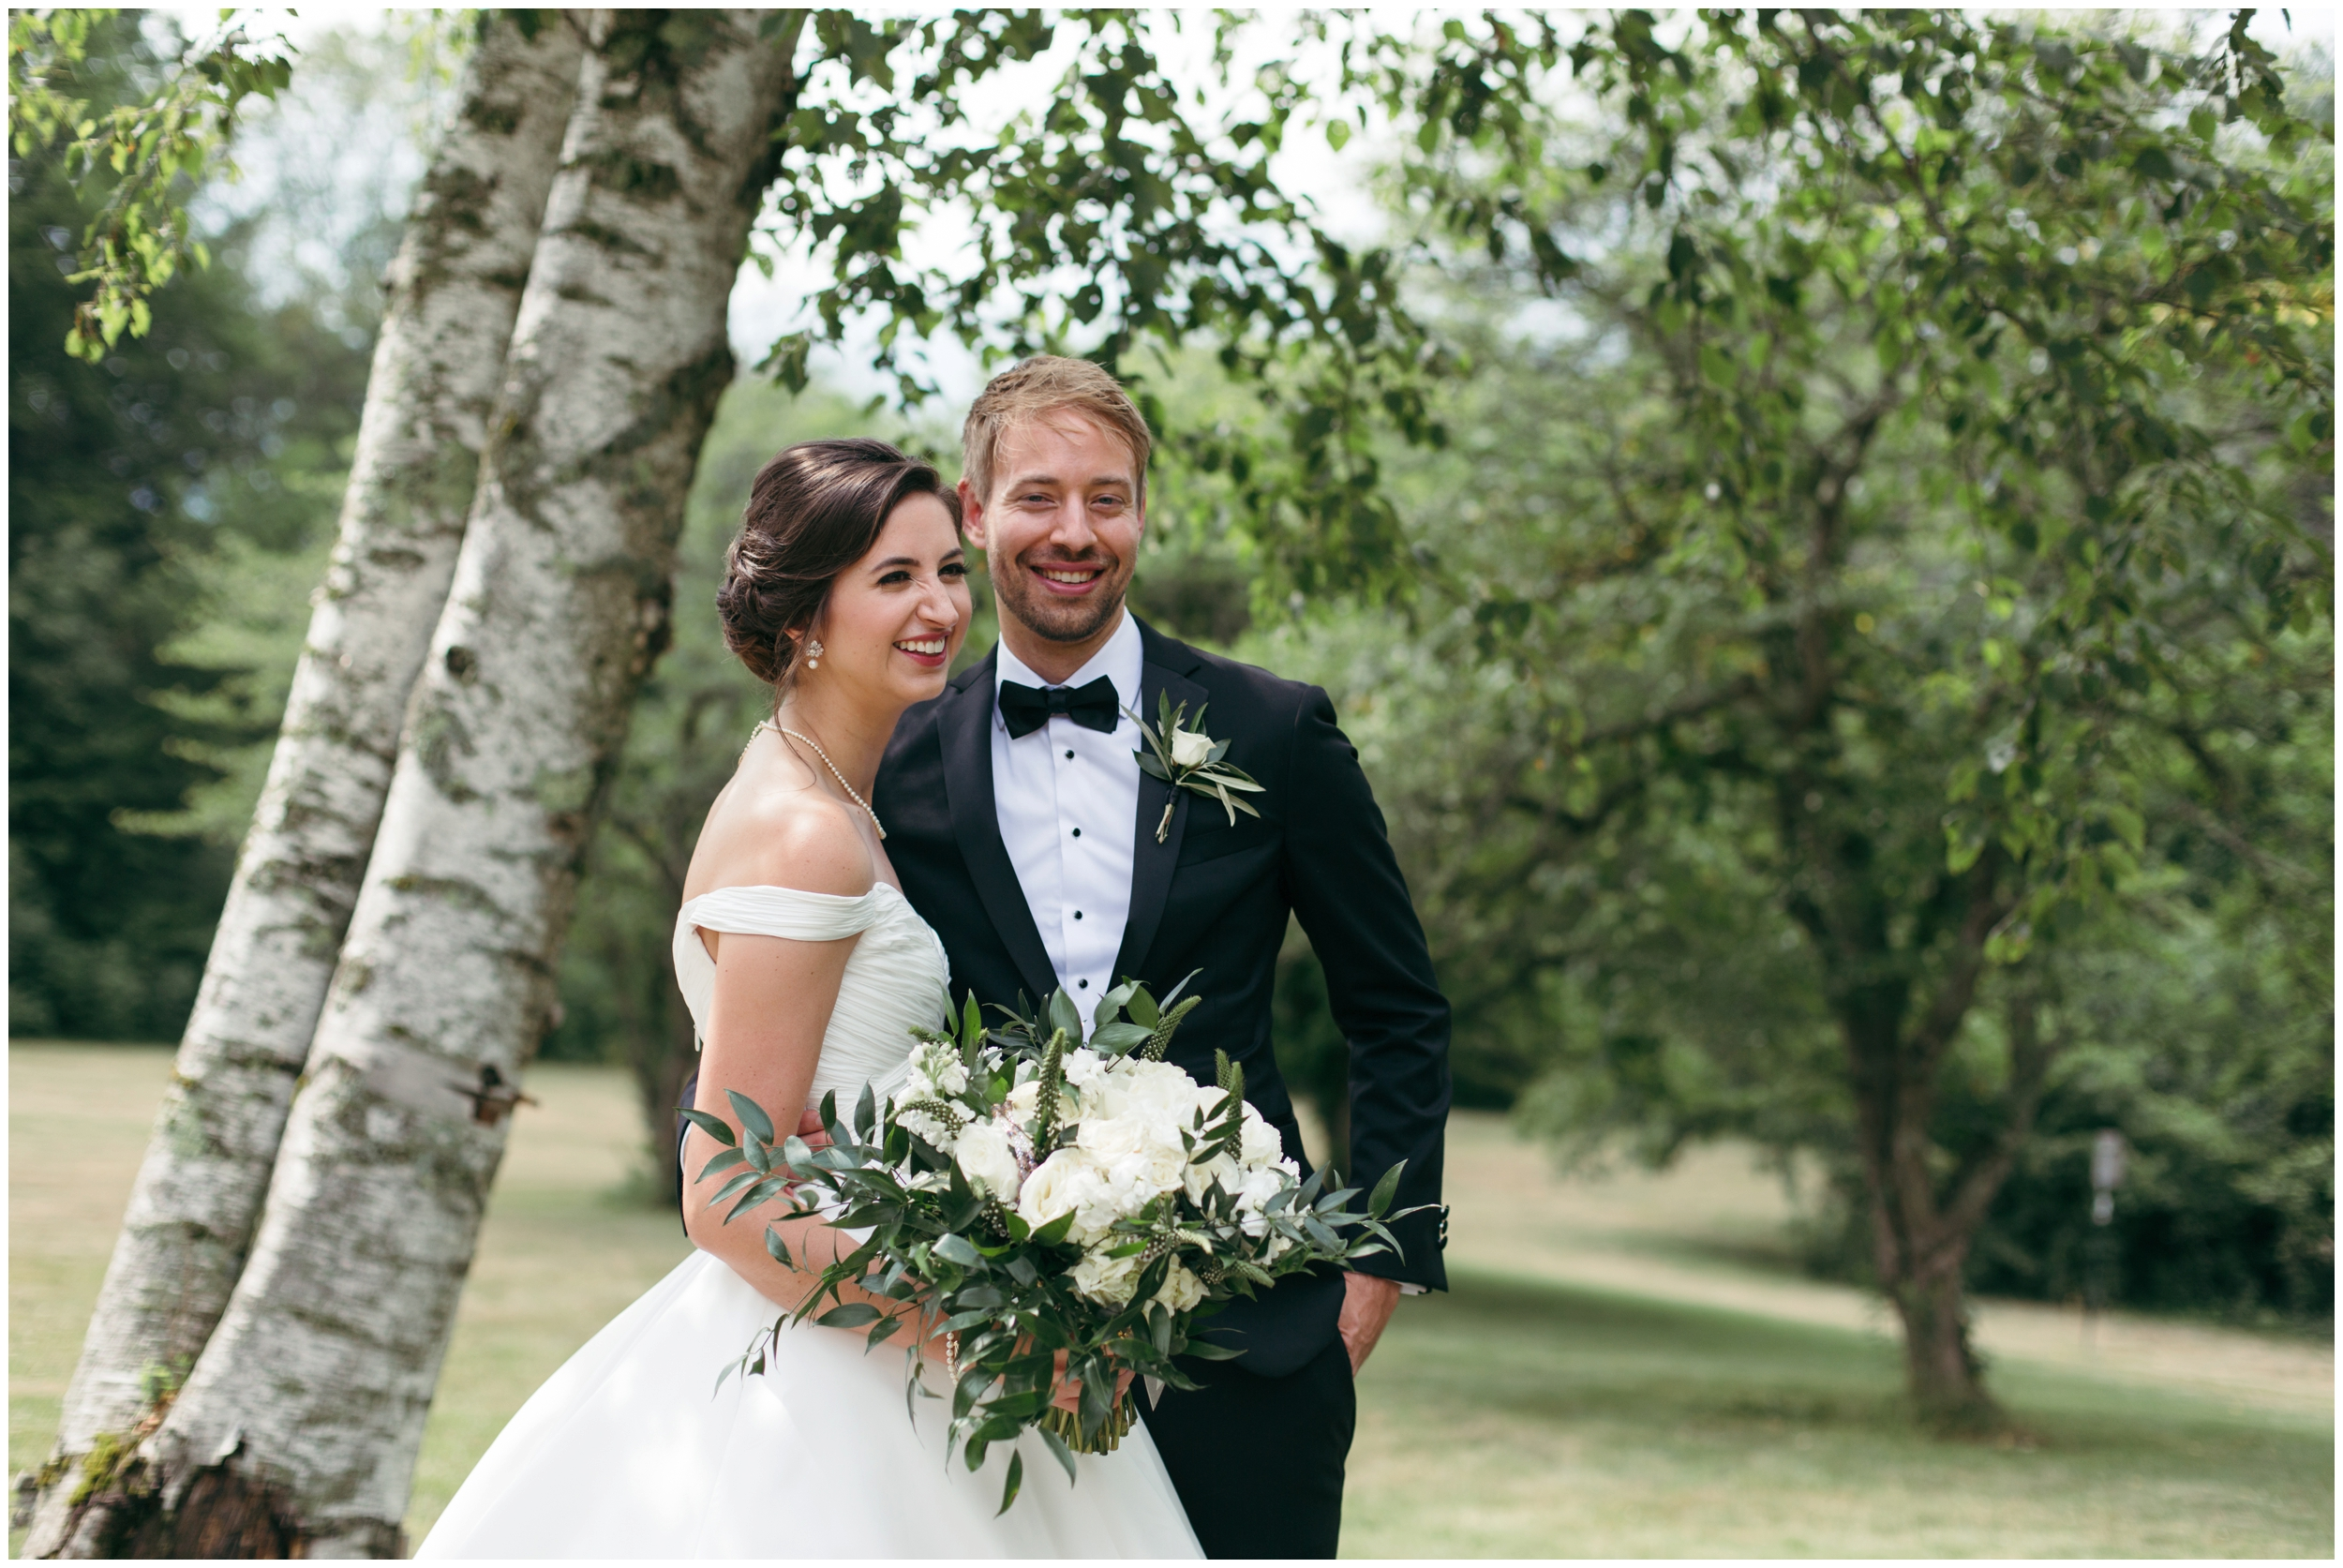 Willowdale-Estate-Wedding-Bailey-Q-Photo-Boston-Wedding-Photographer-014.JPG